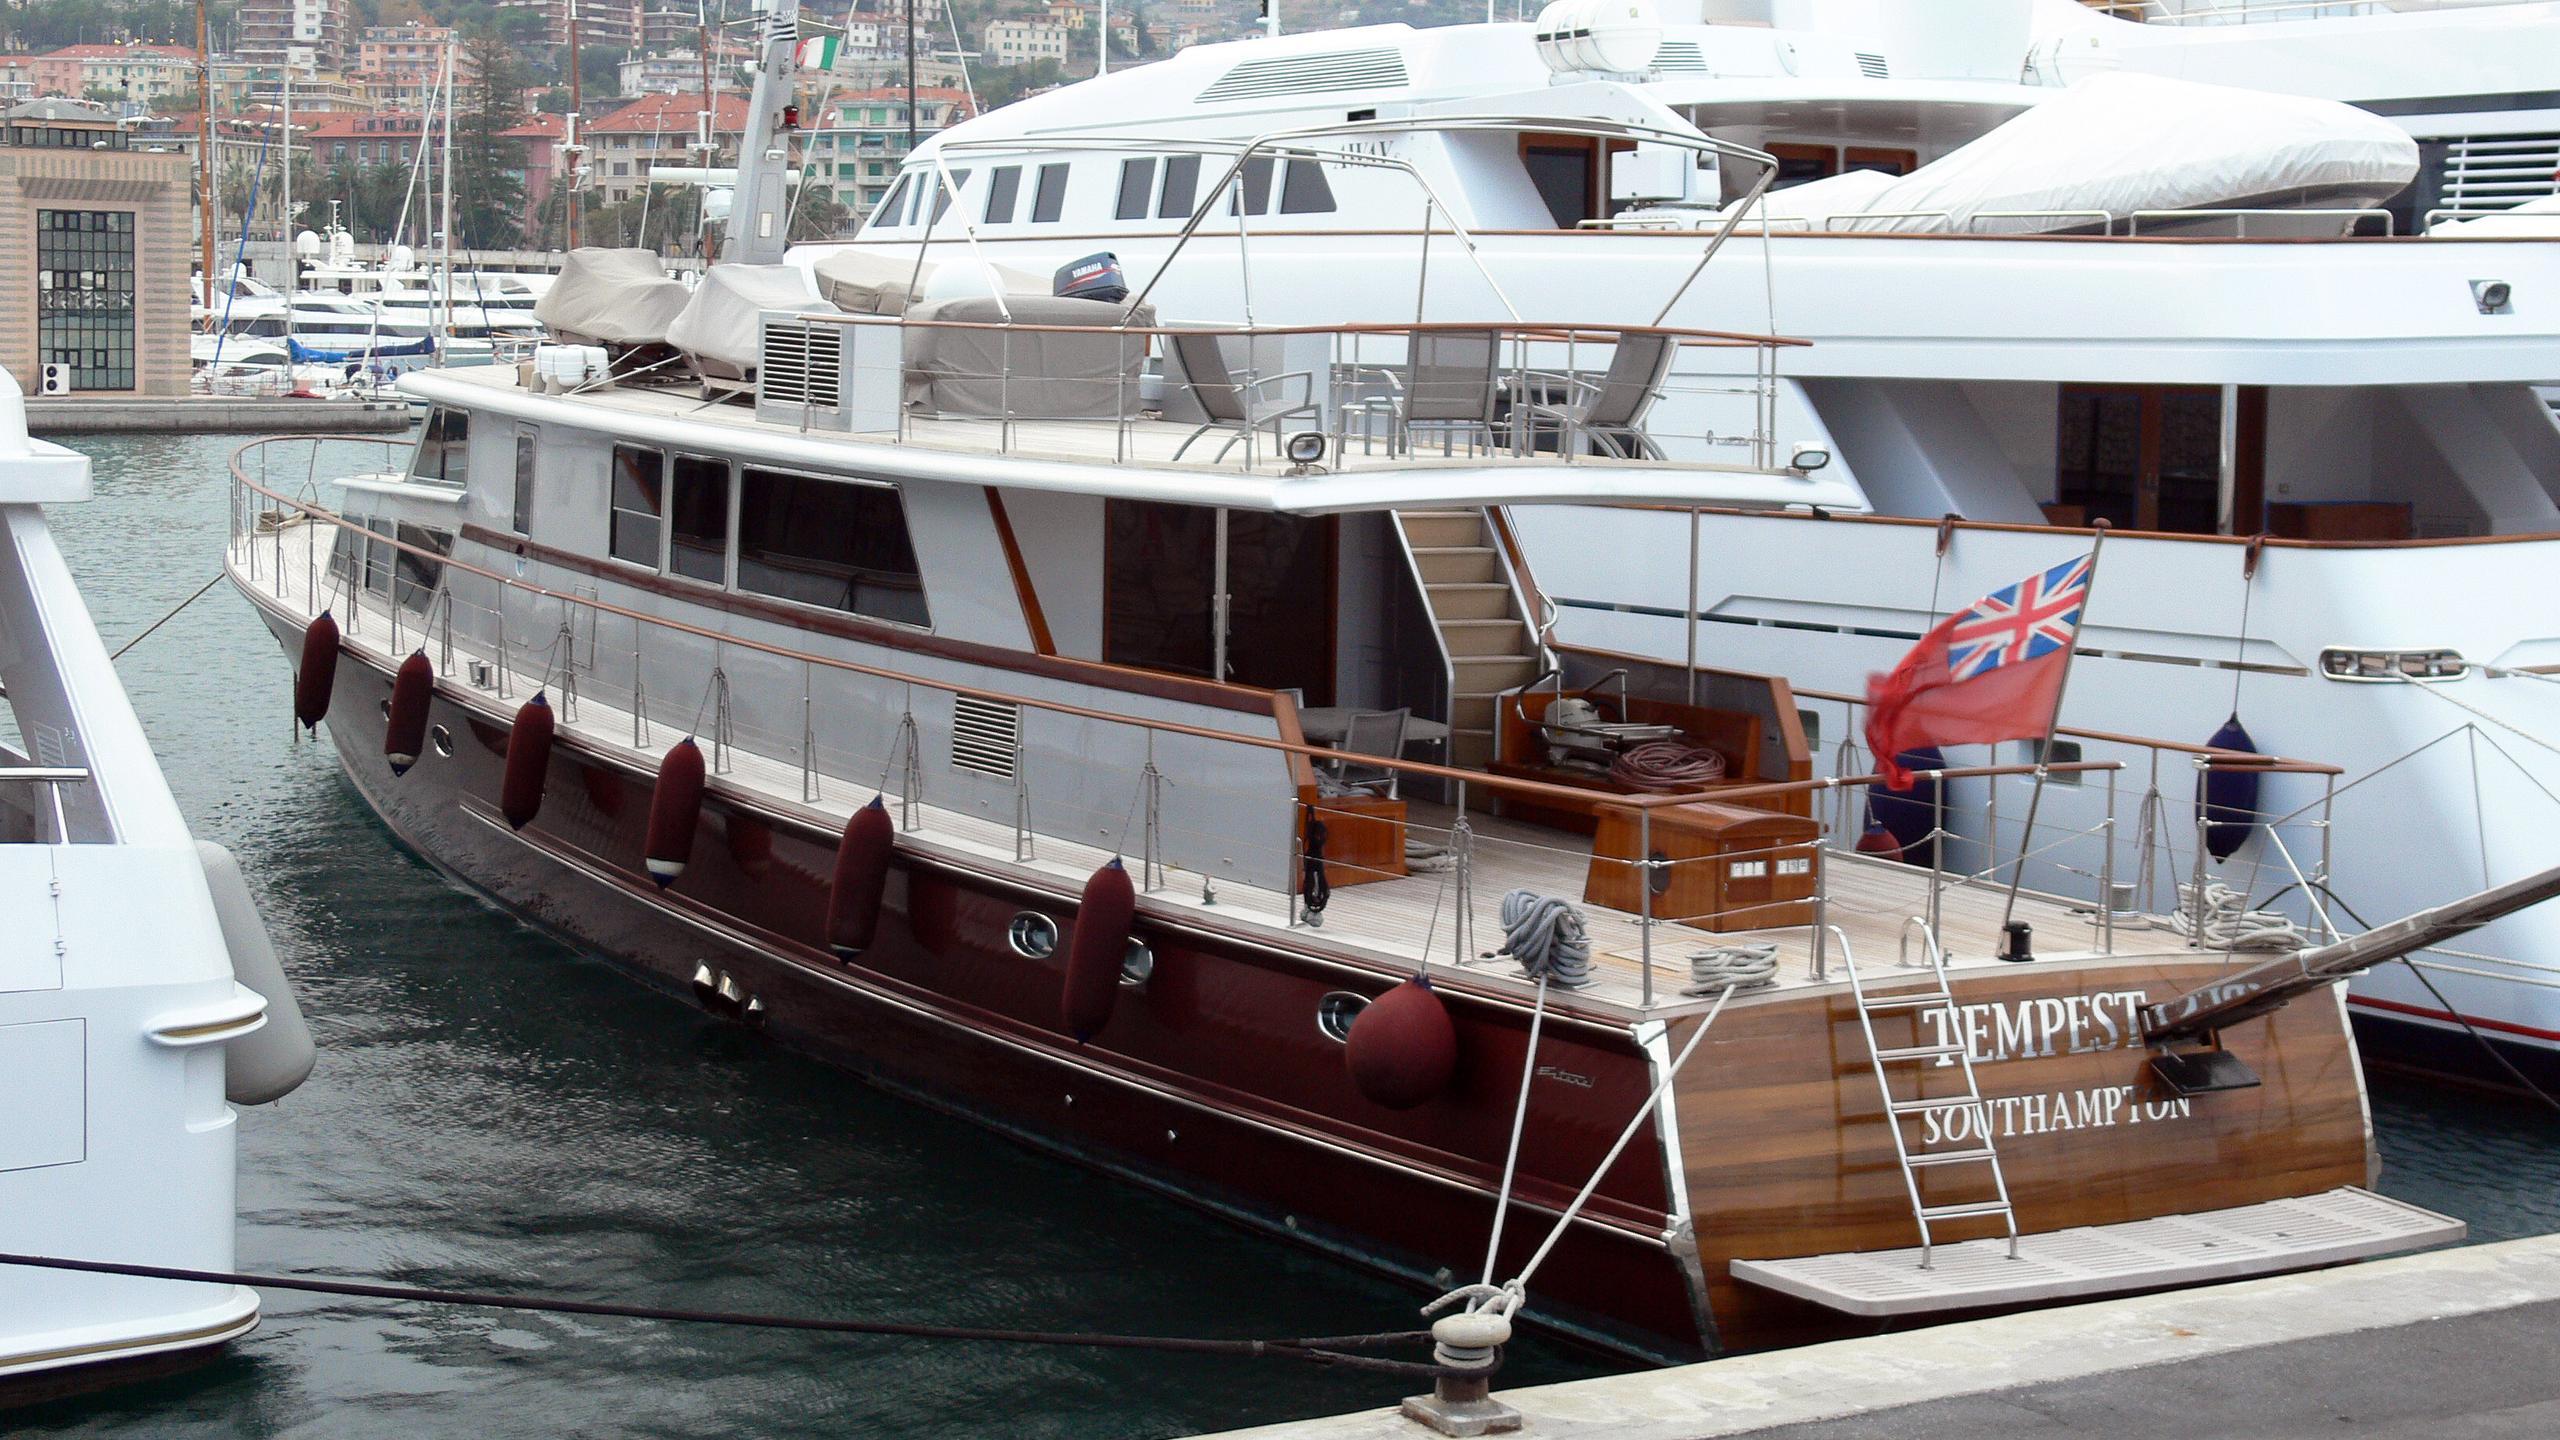 tempest-ws-motor-yacht-esterel-1963-32m-stern